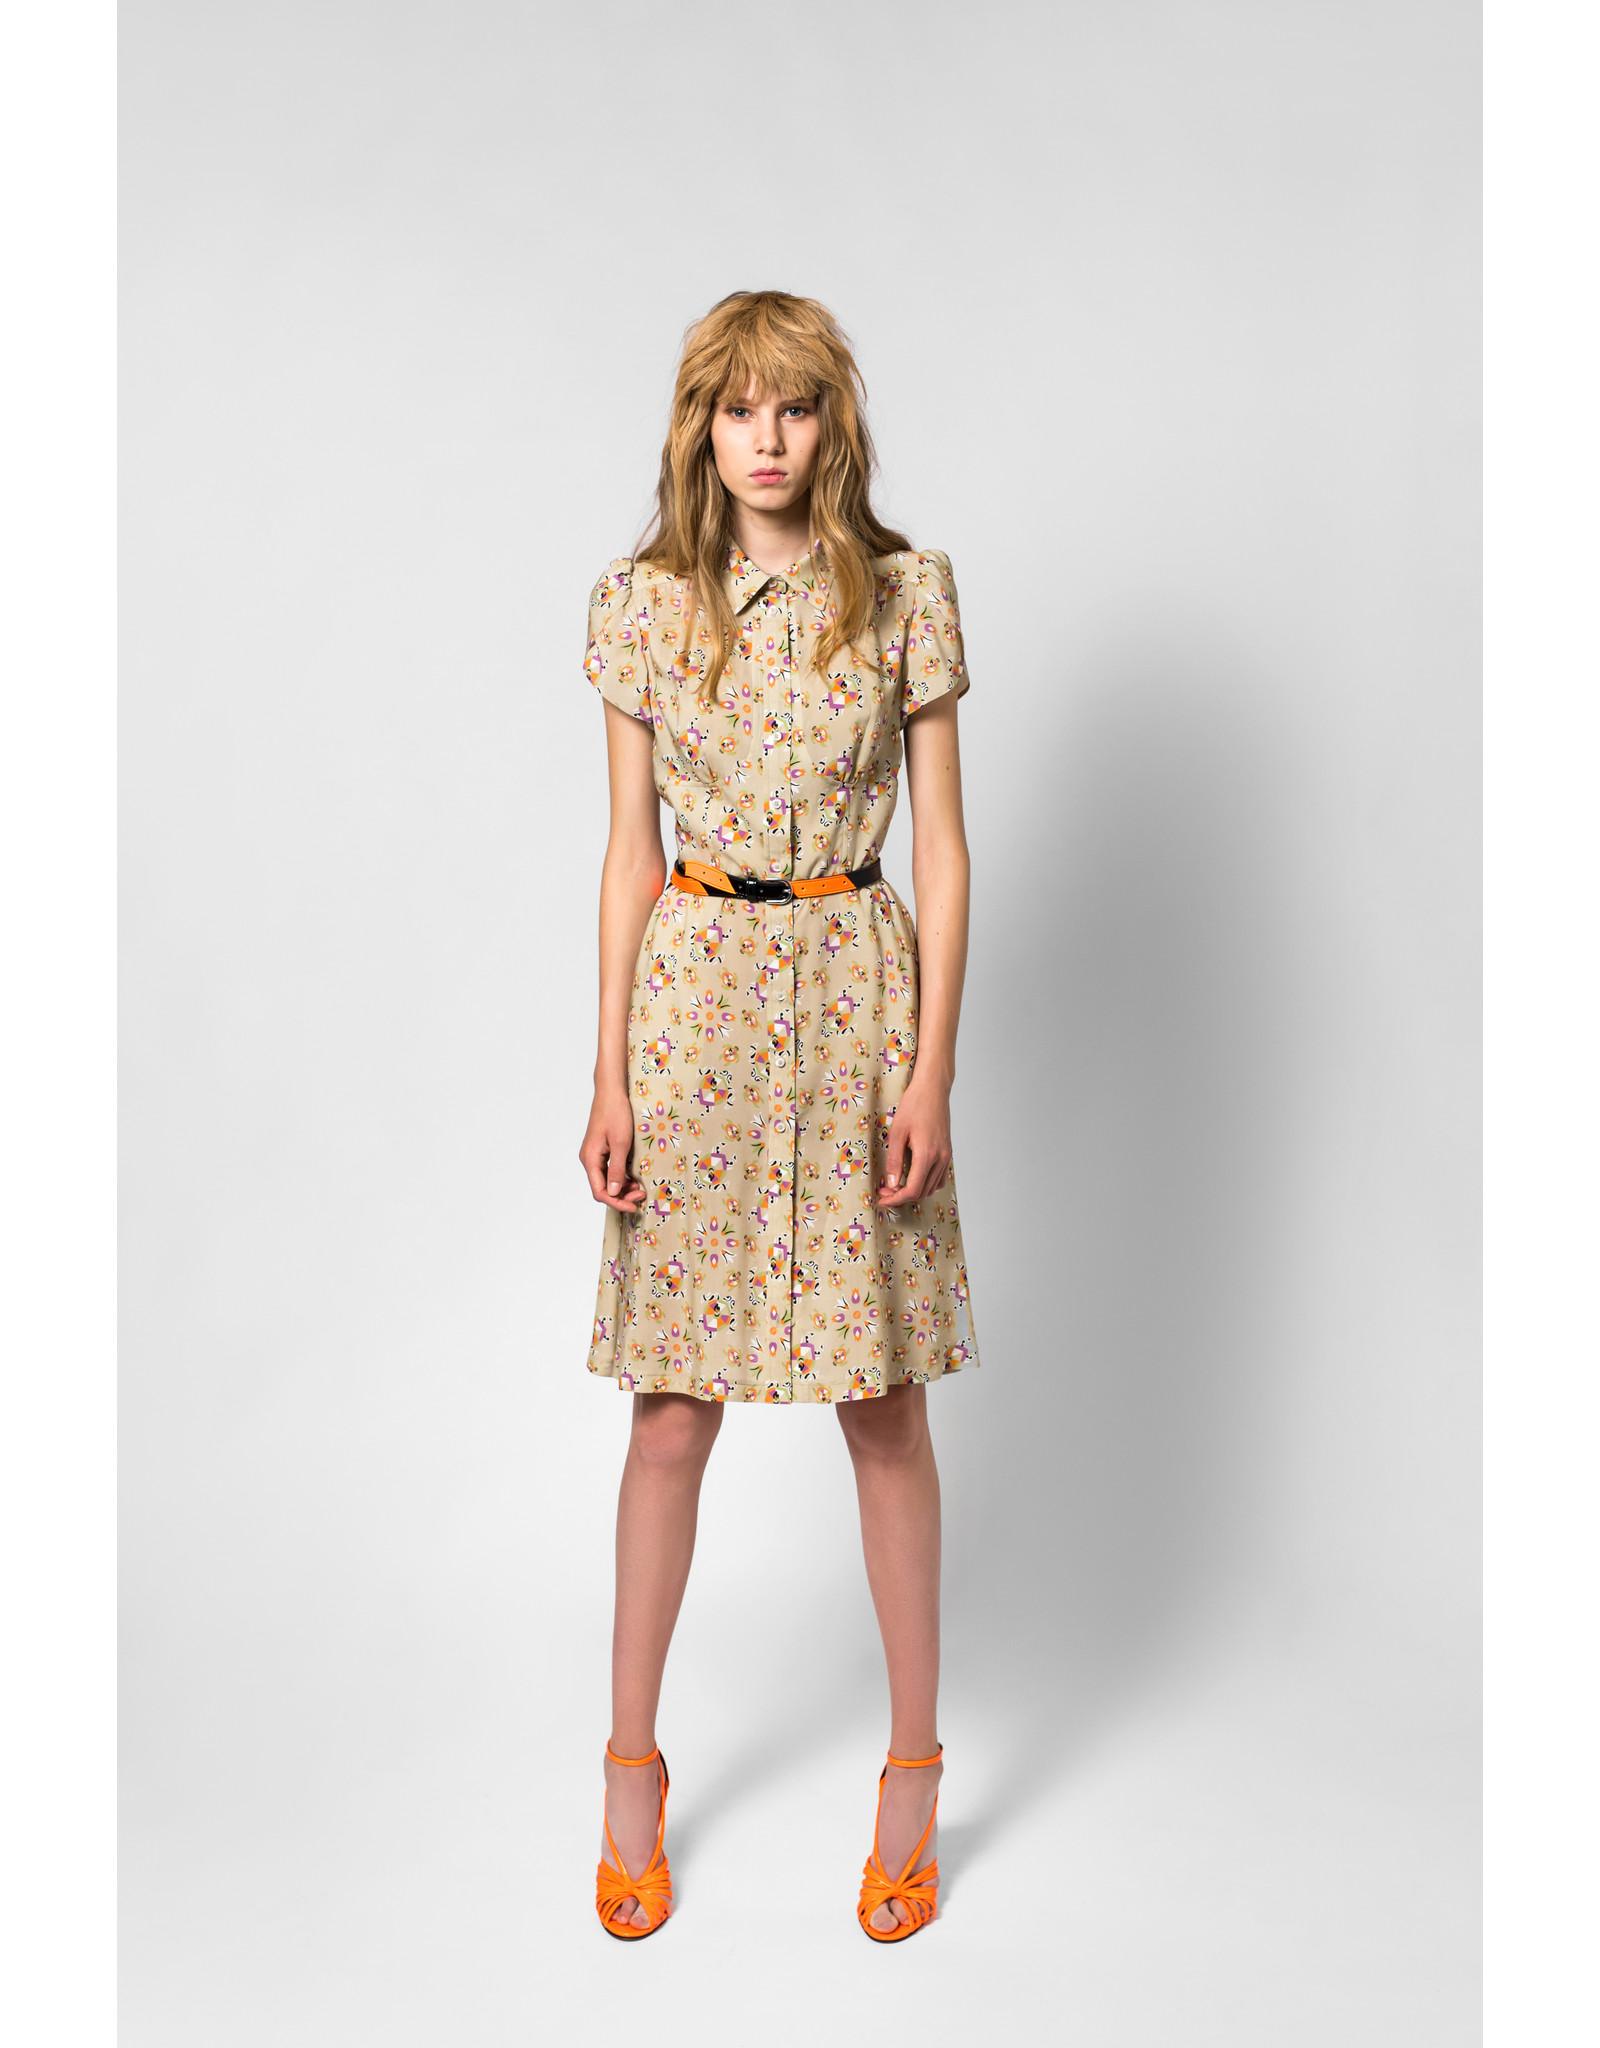 SIS by Spijkers en Spijkers SS20 537B-H Mania Dress